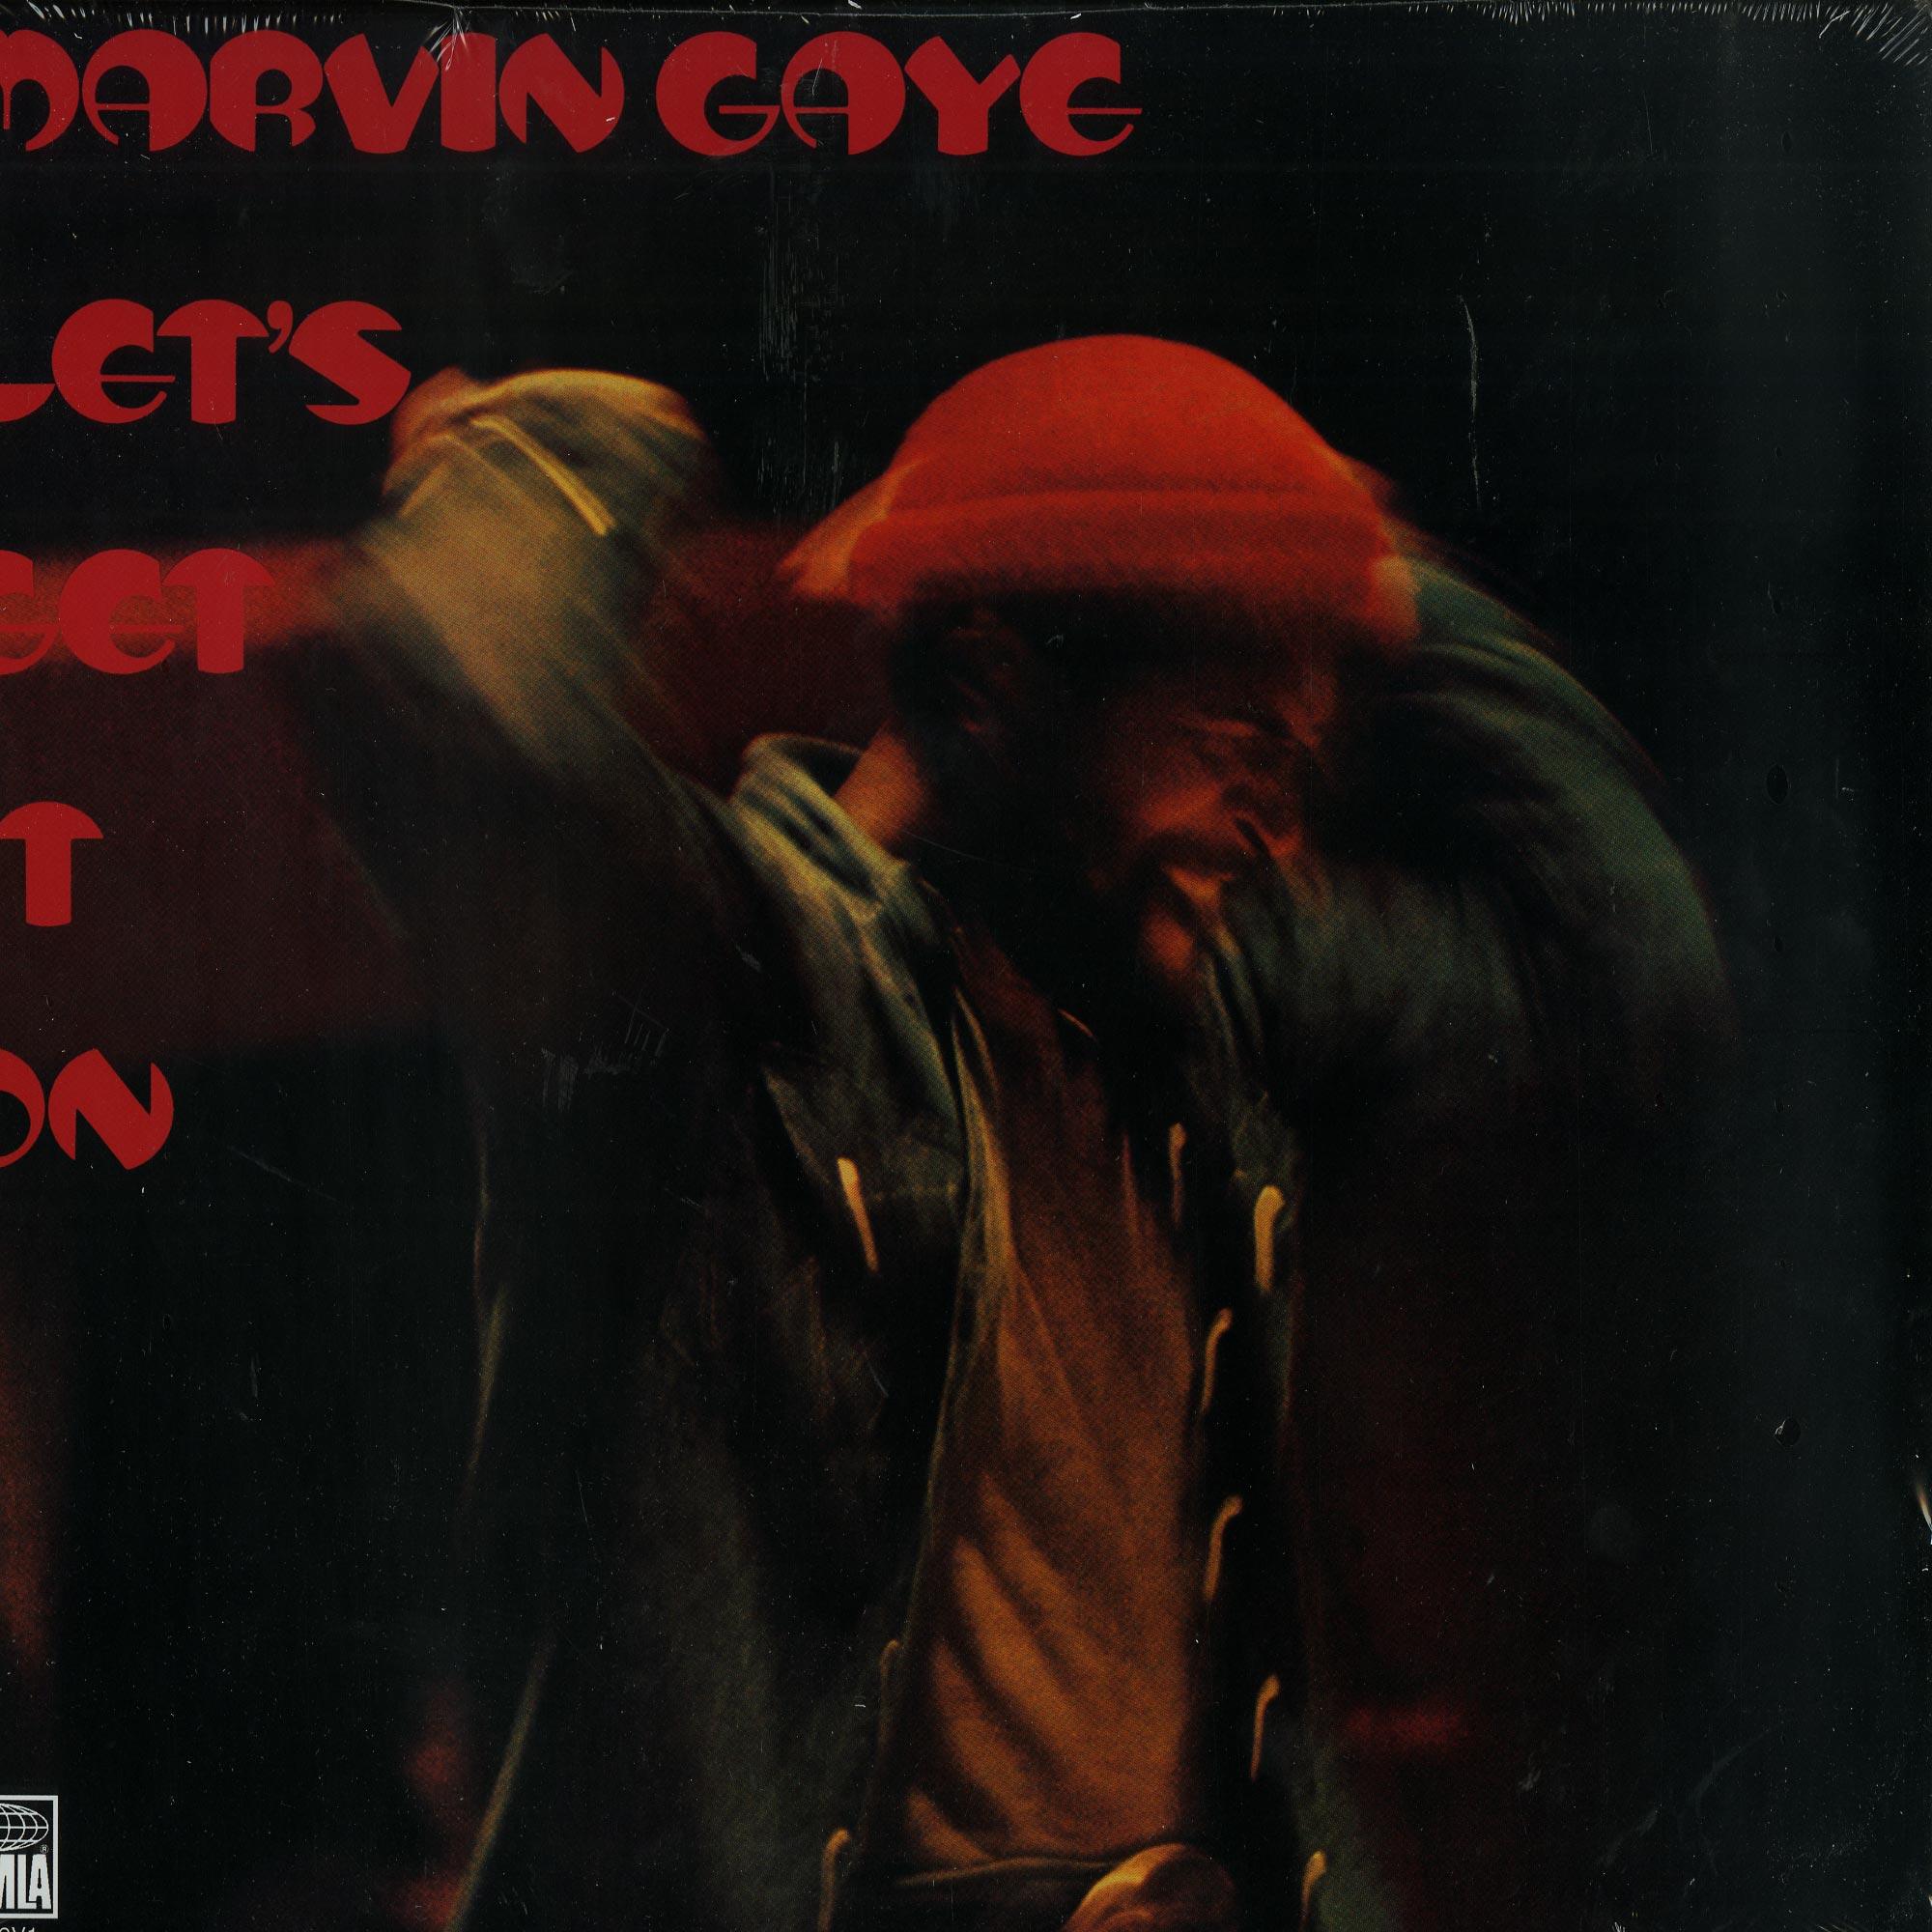 Marvin Gaye - LET S GET IT ON